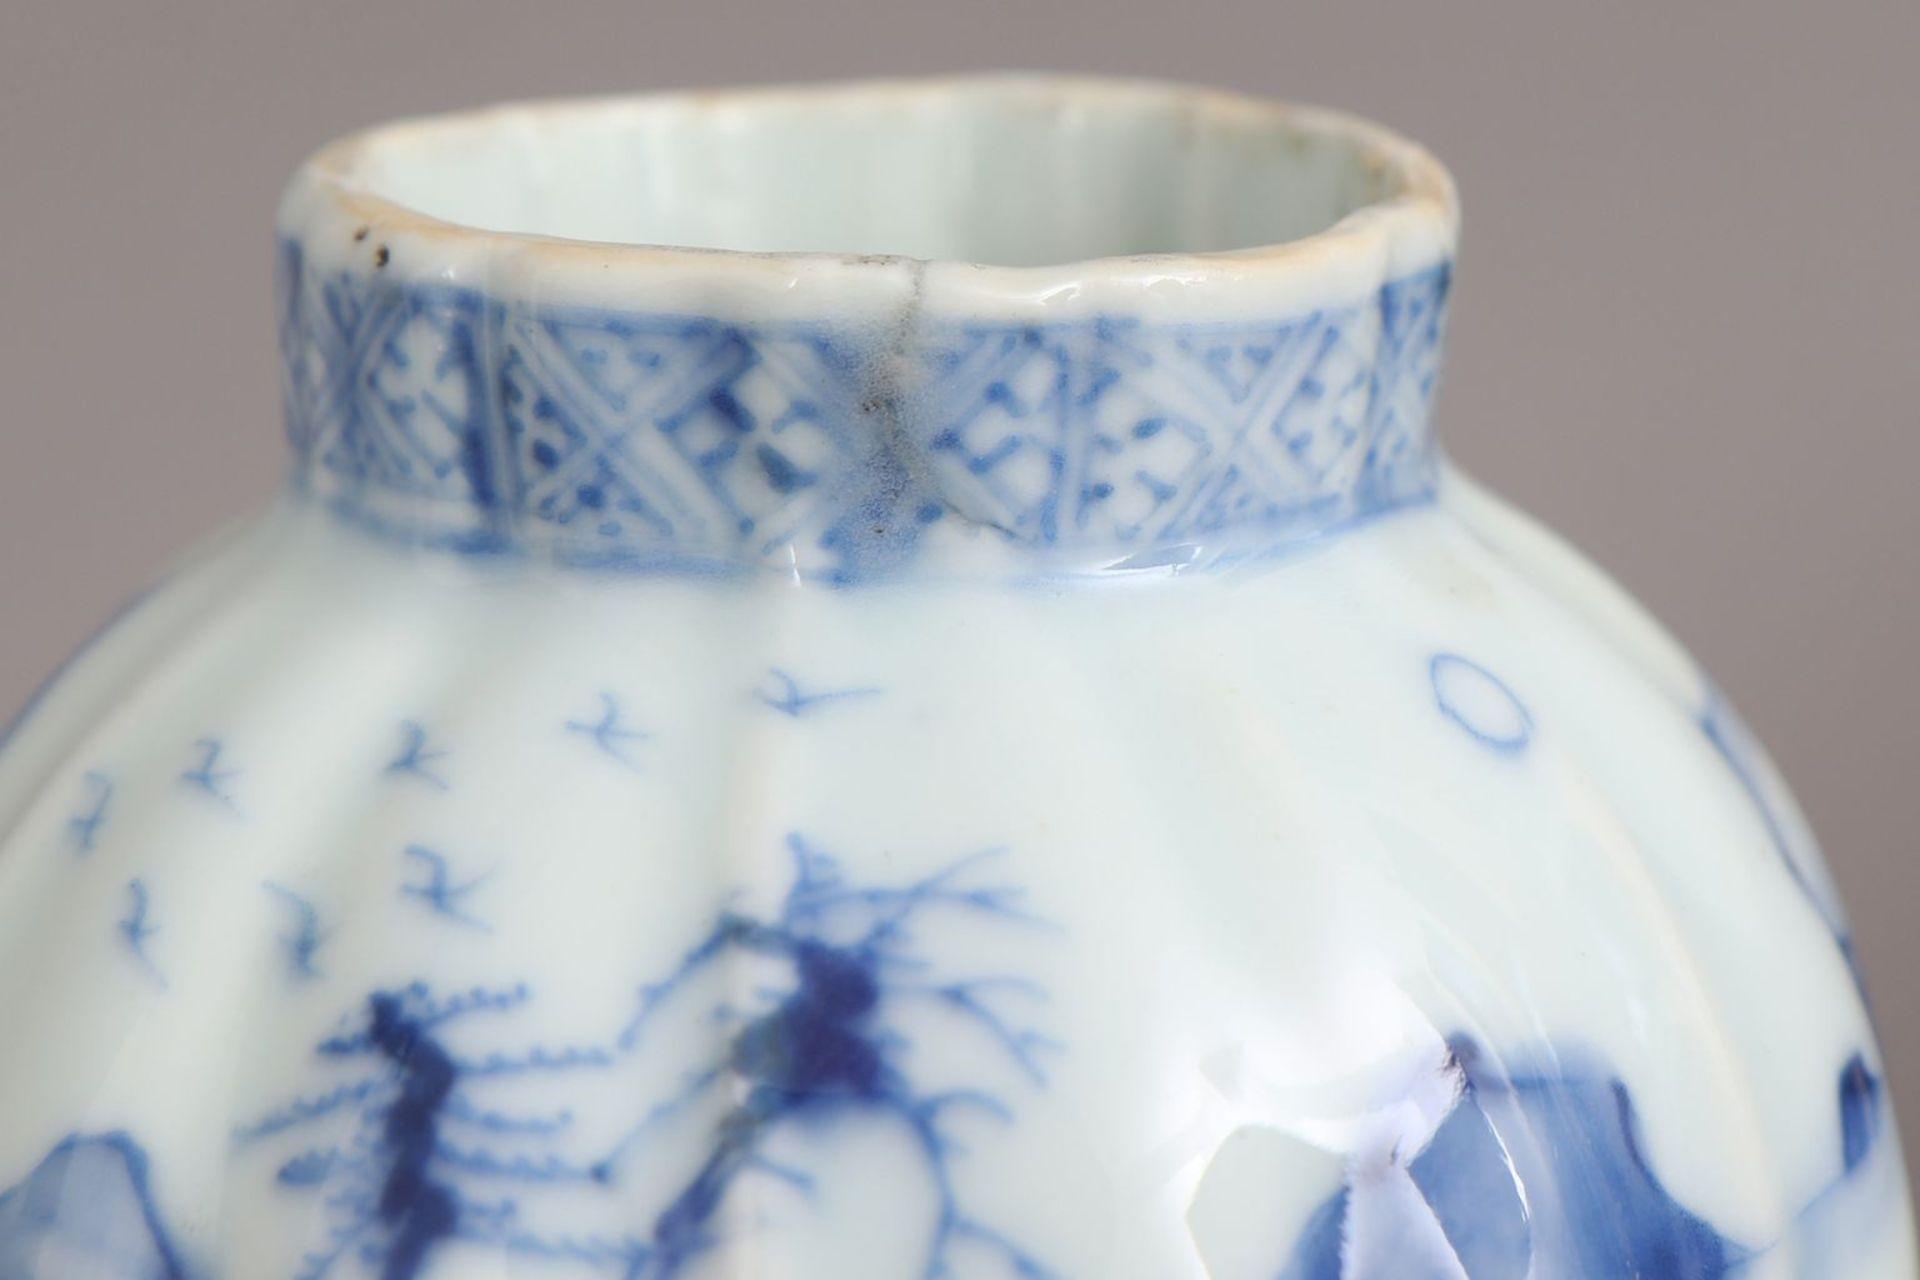 Chinesisches Vasengefäß mit Blaumalerei - Image 5 of 5